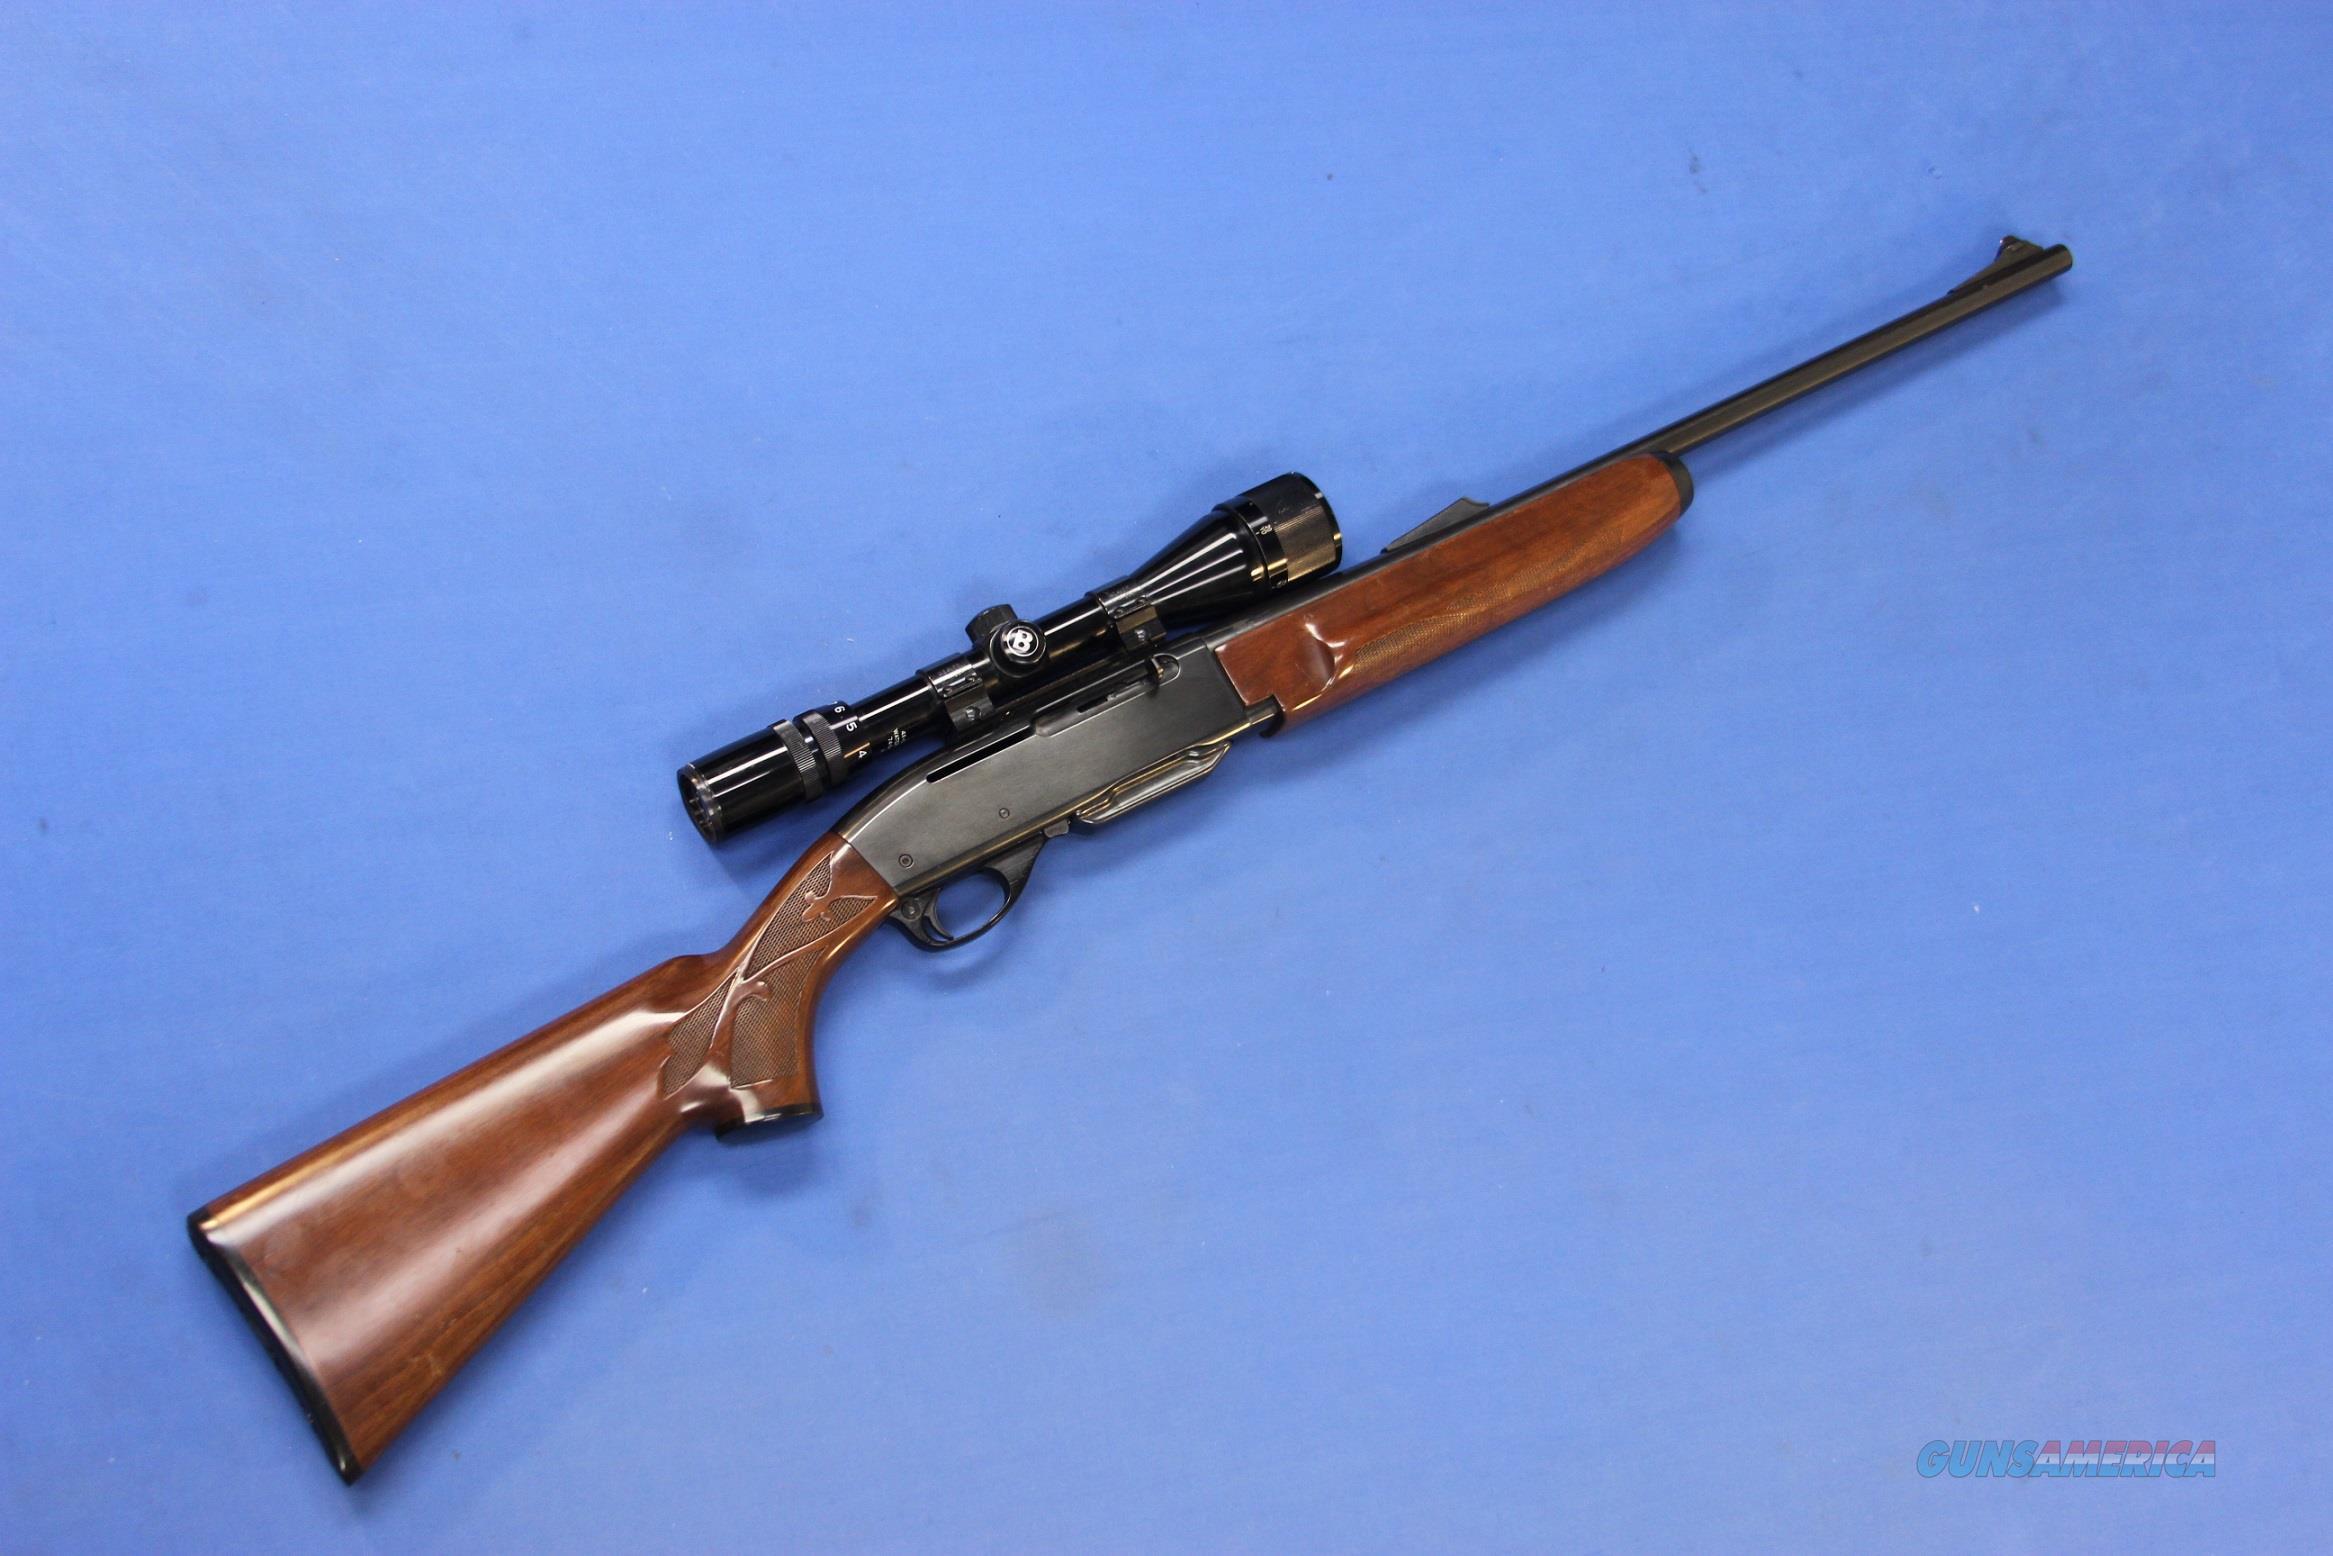 Remington 7400  270 Win W  Bushnell Scope For Sale